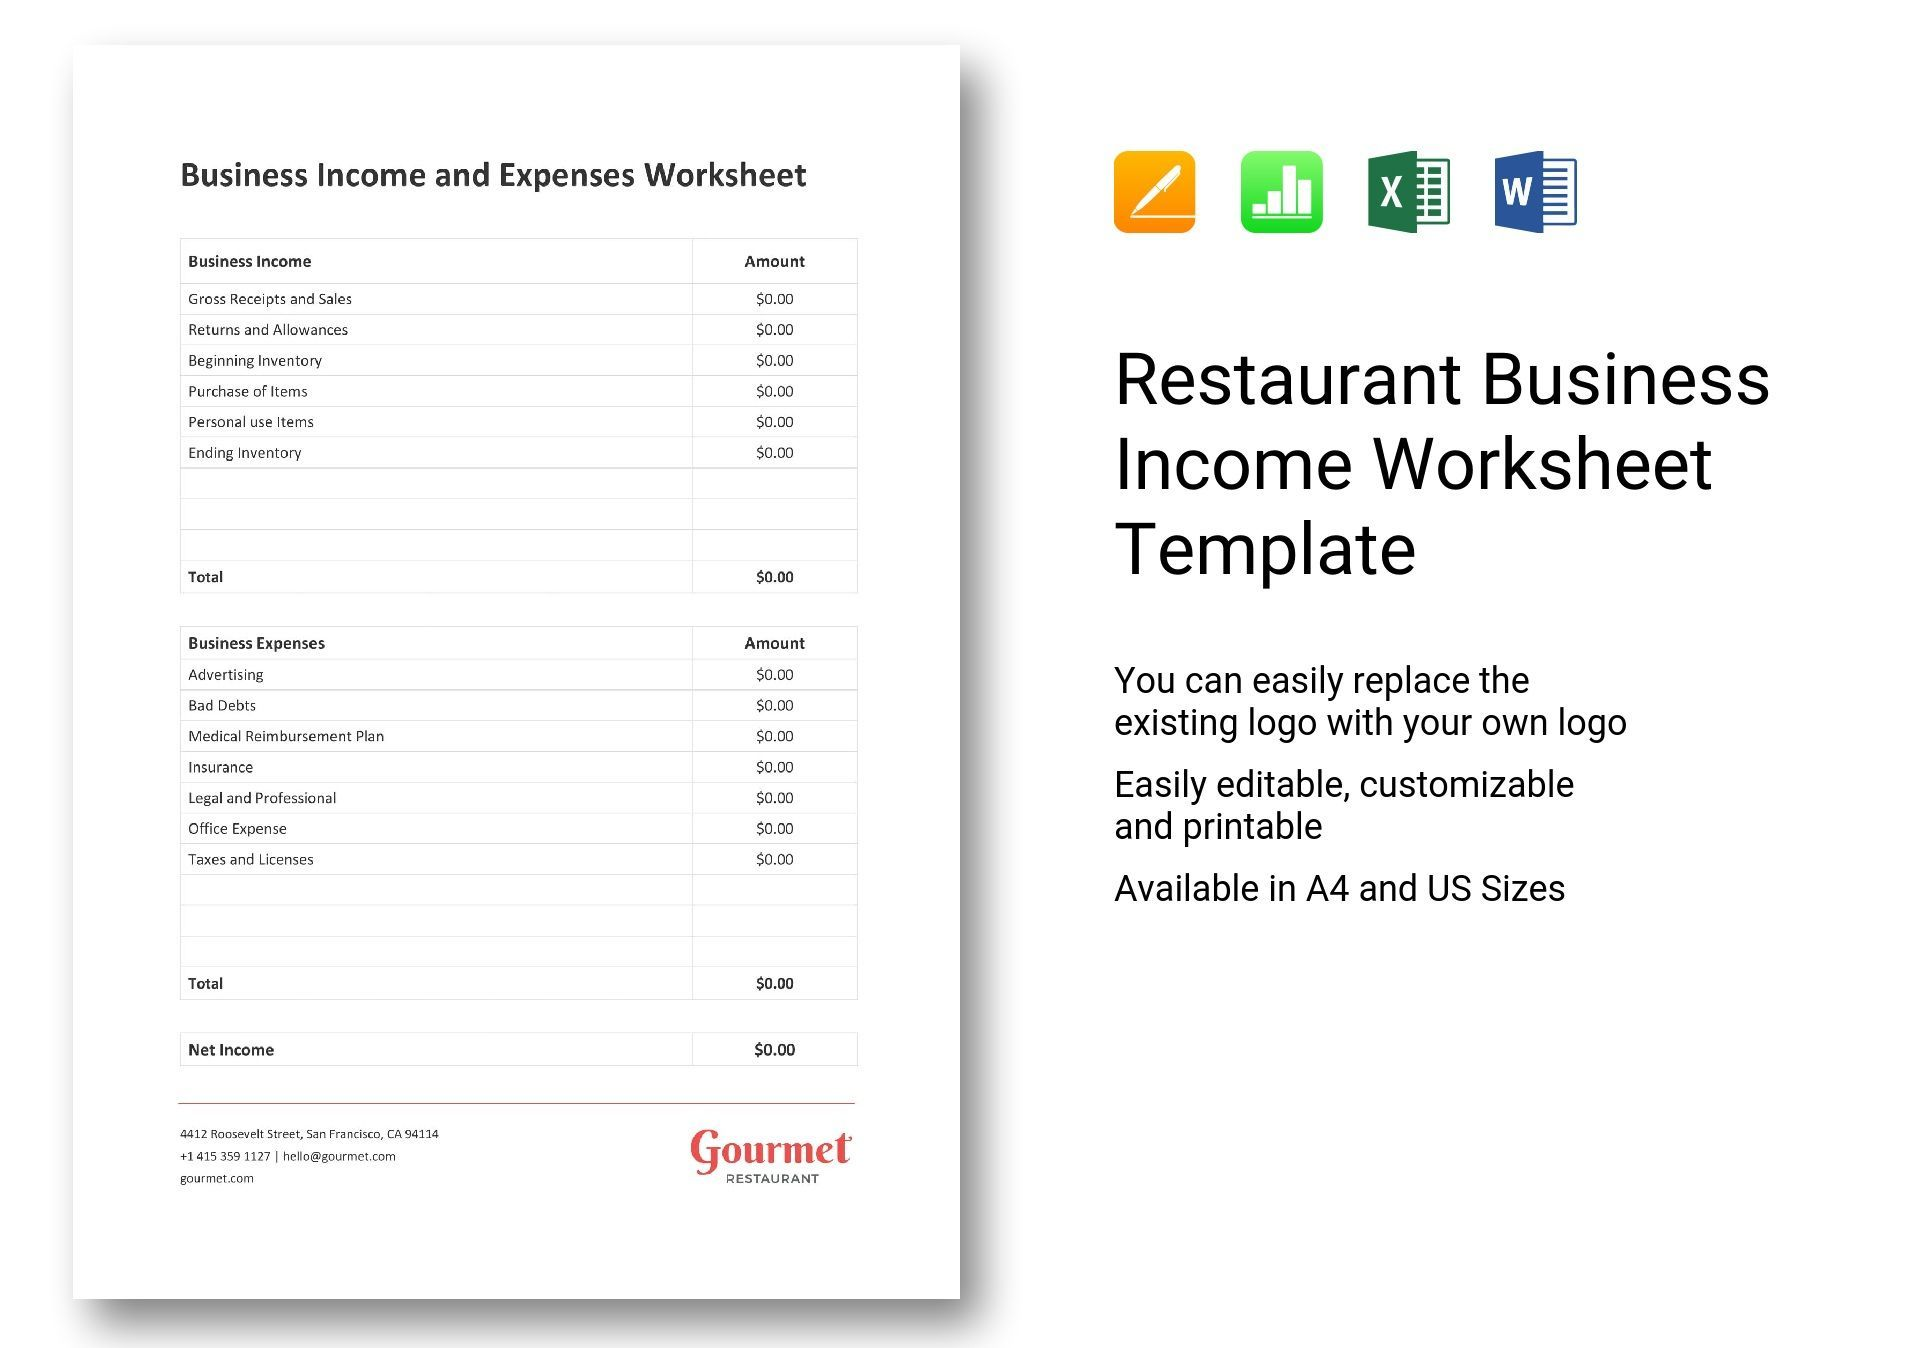 Restaurant Business Income Worksheet Template Worksheet Template